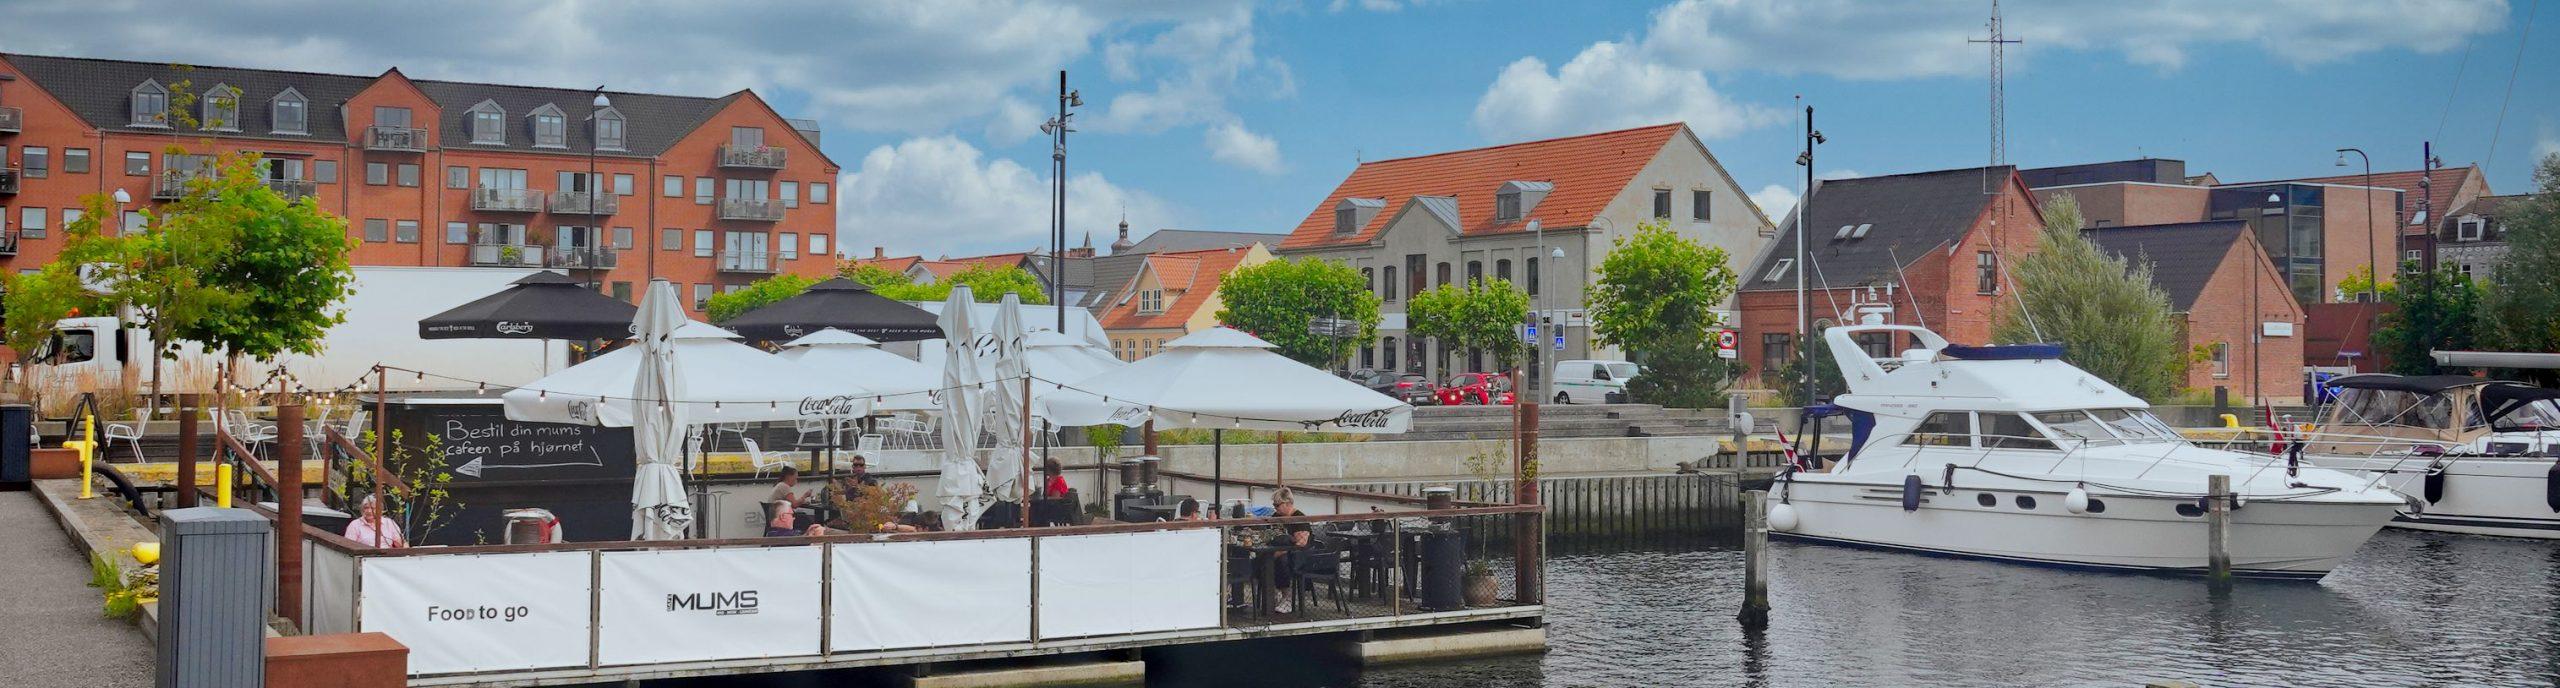 Fredericia City-Hafen-Panorama